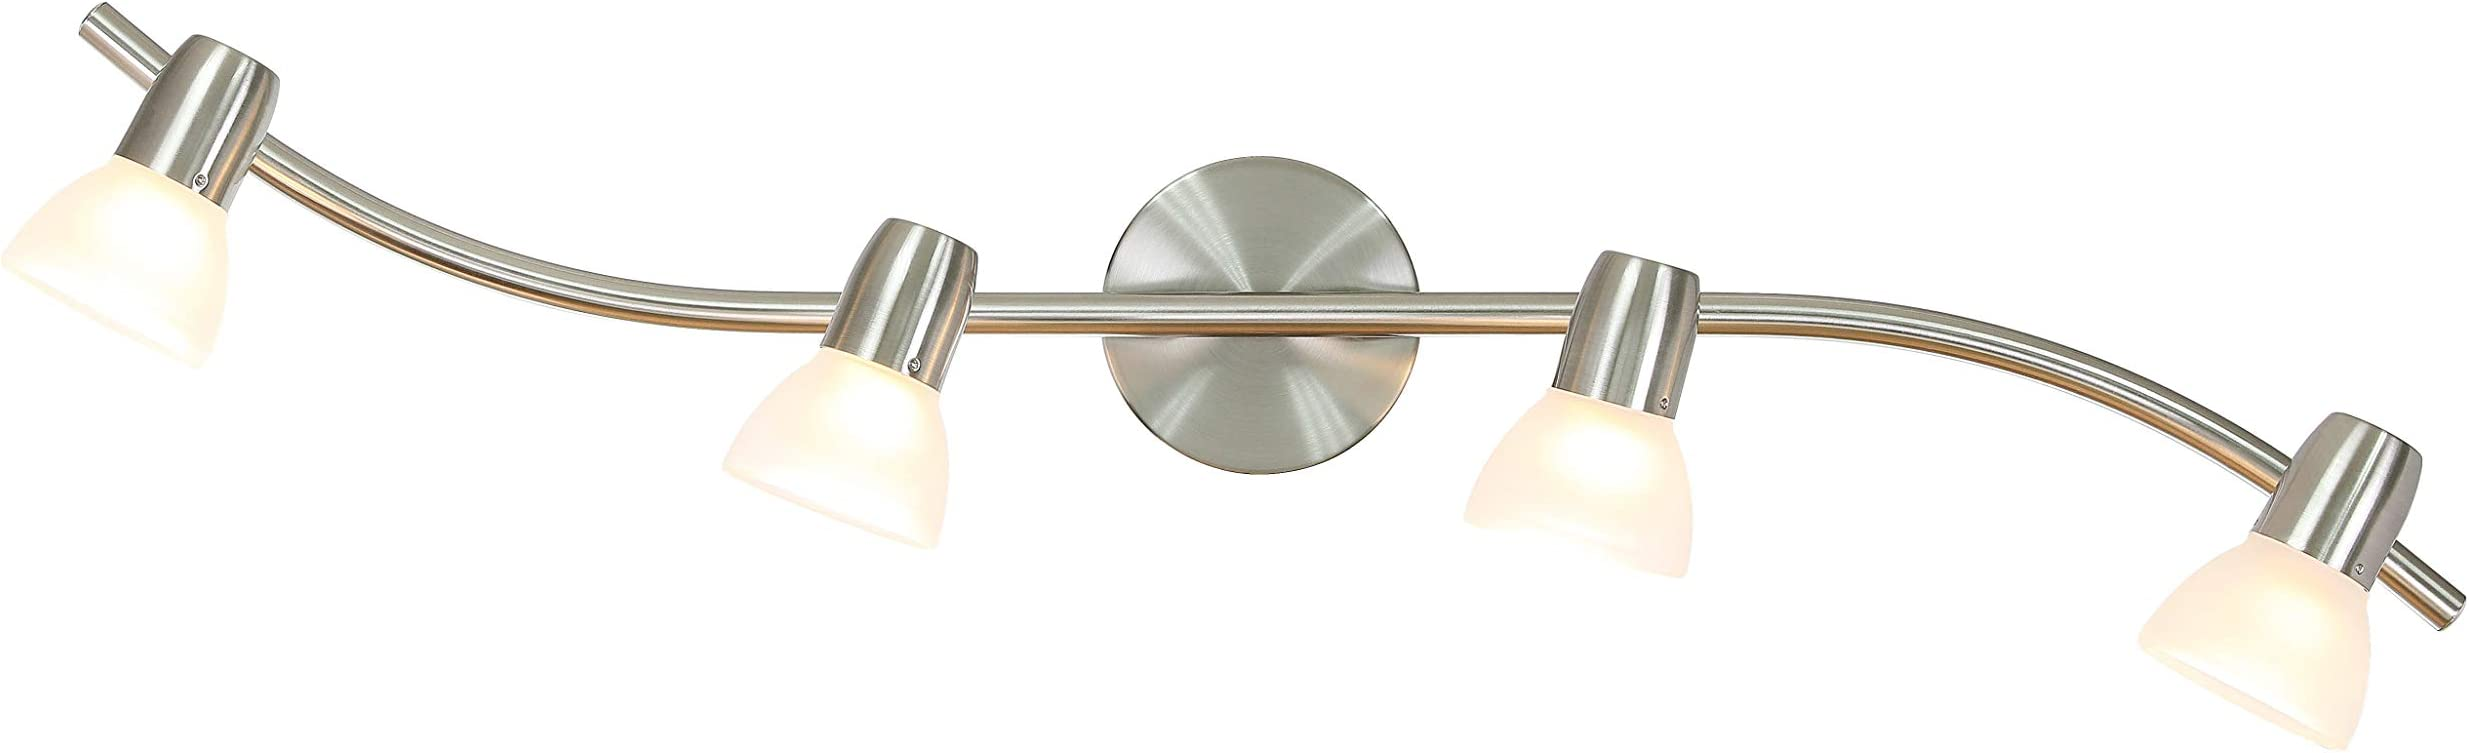 XiNBEi Lighting Track Light, 4 Light Kitchen Track Lighting, Modern S-Shaped Ceiling Track Light Bar Brushed Nickel Finish XB-TR1223-4-BN